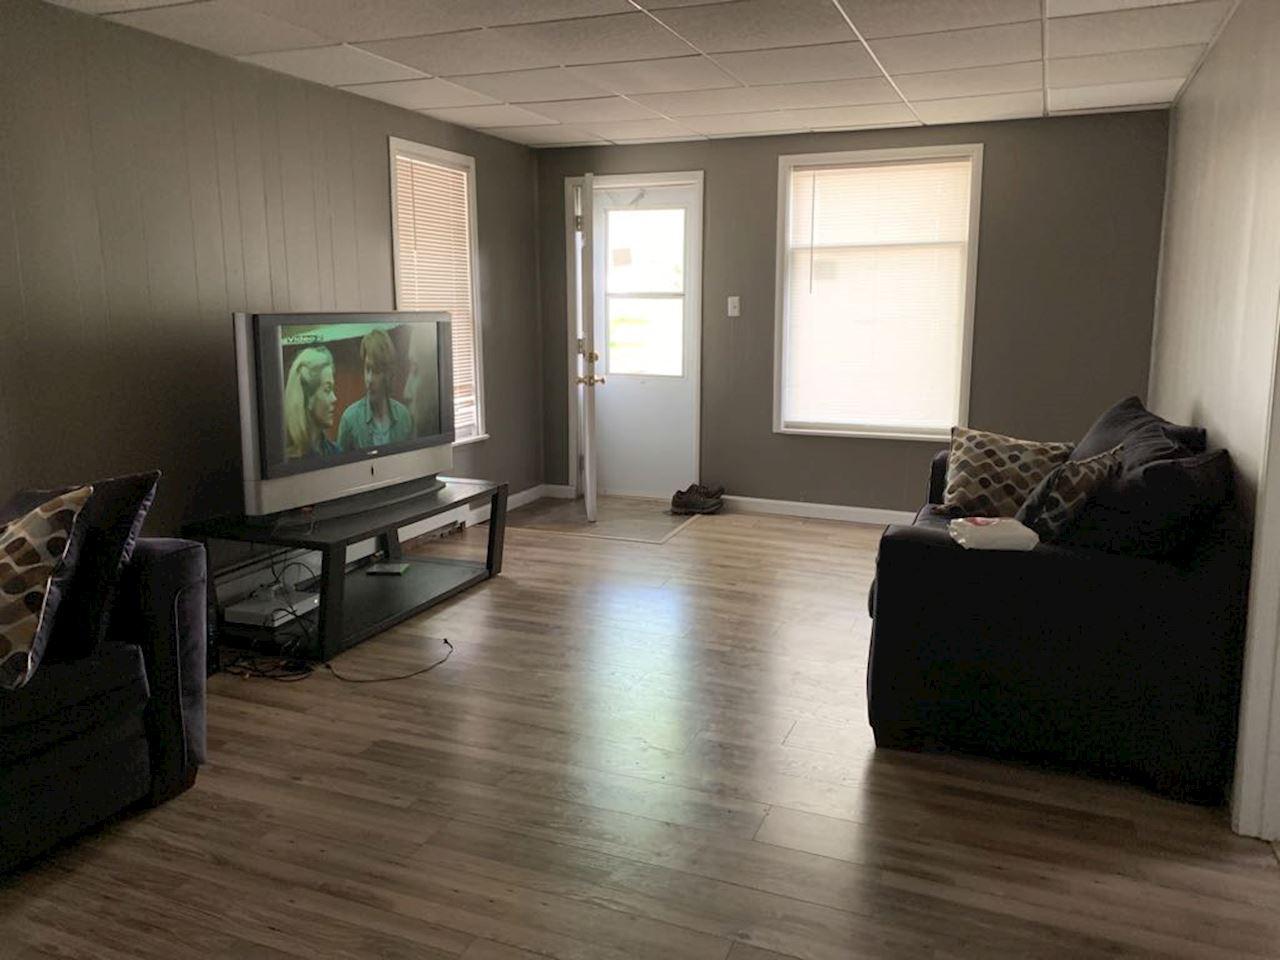 investment property - 142 Jackson St, Michigan City, IN 46360, La Porte - image 6